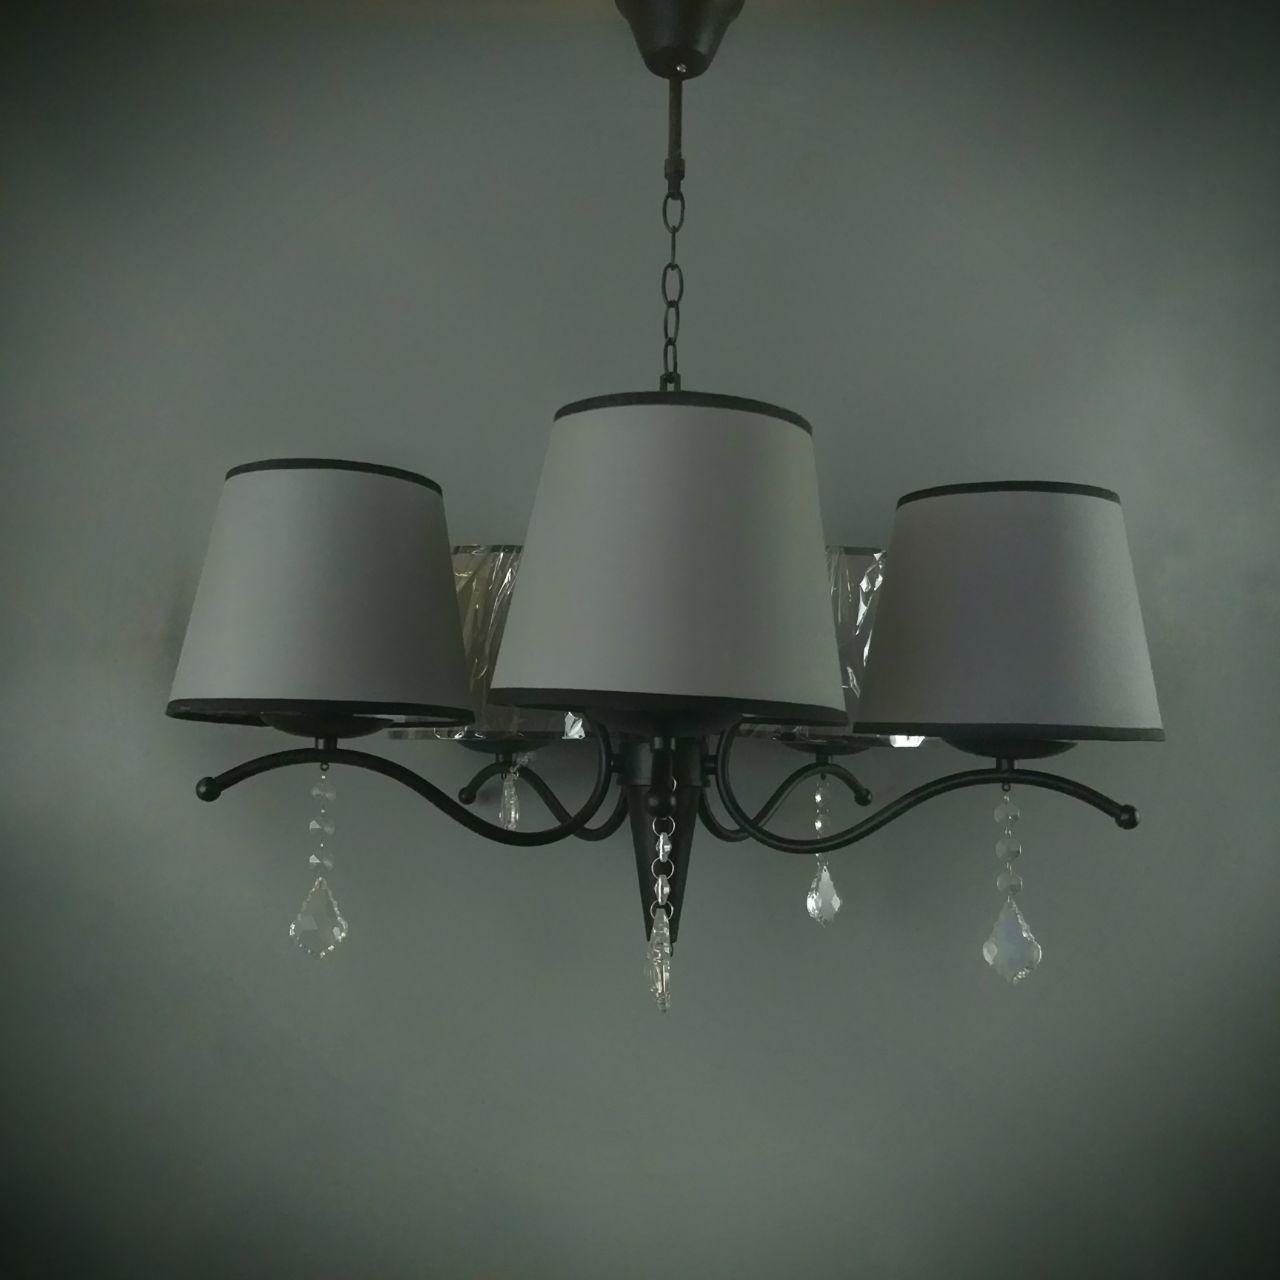 Люстра подвесная на 5 ламп  06-8609/5 BK+BR